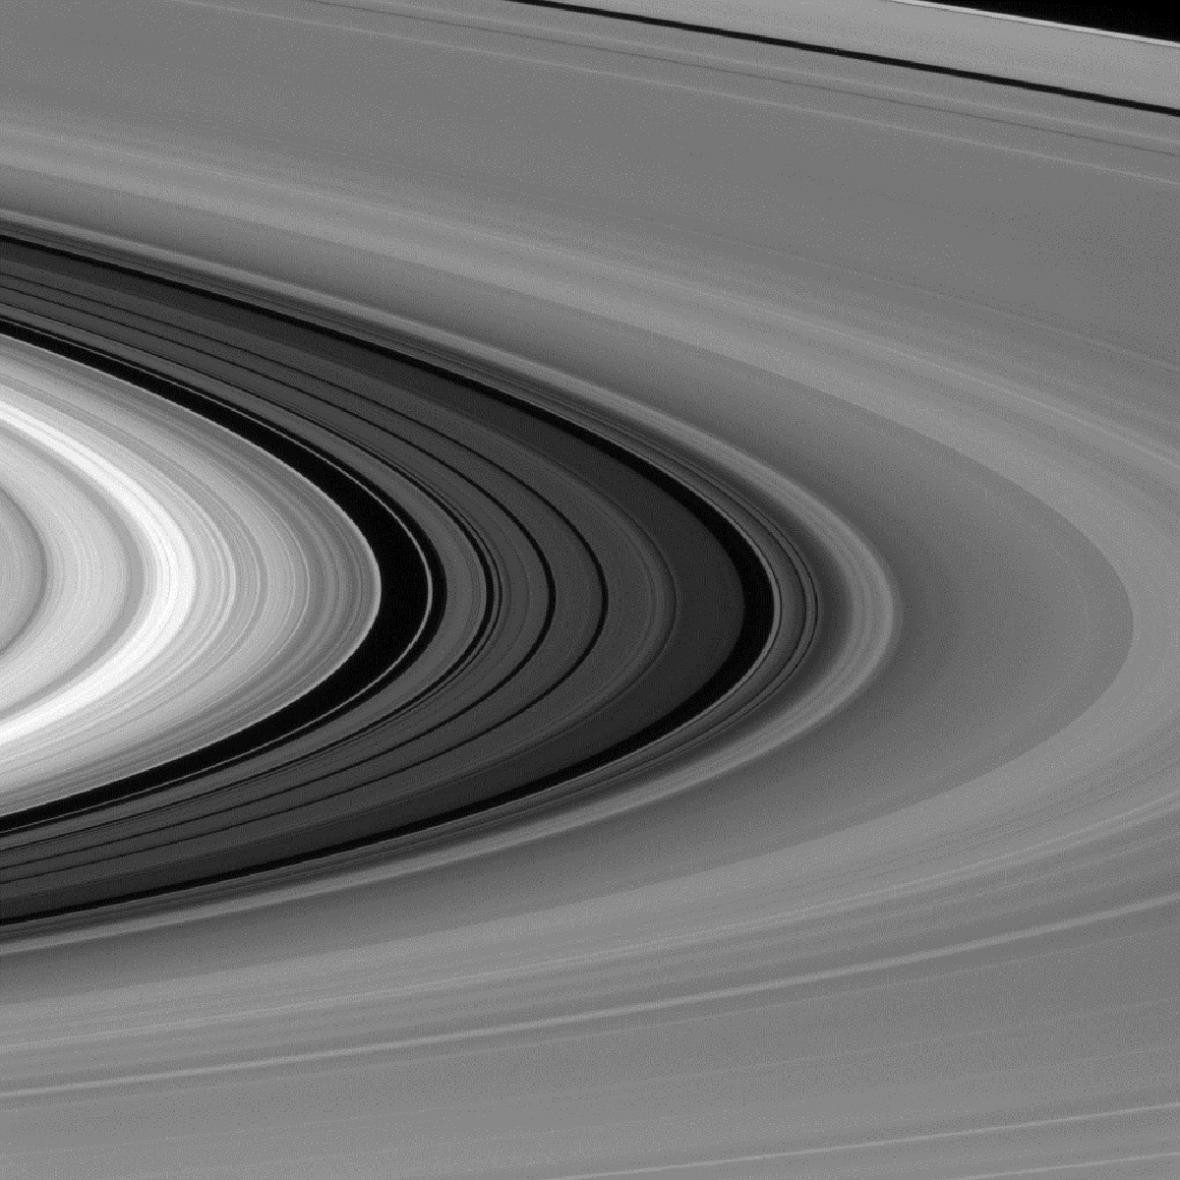 Saturnův prstenec